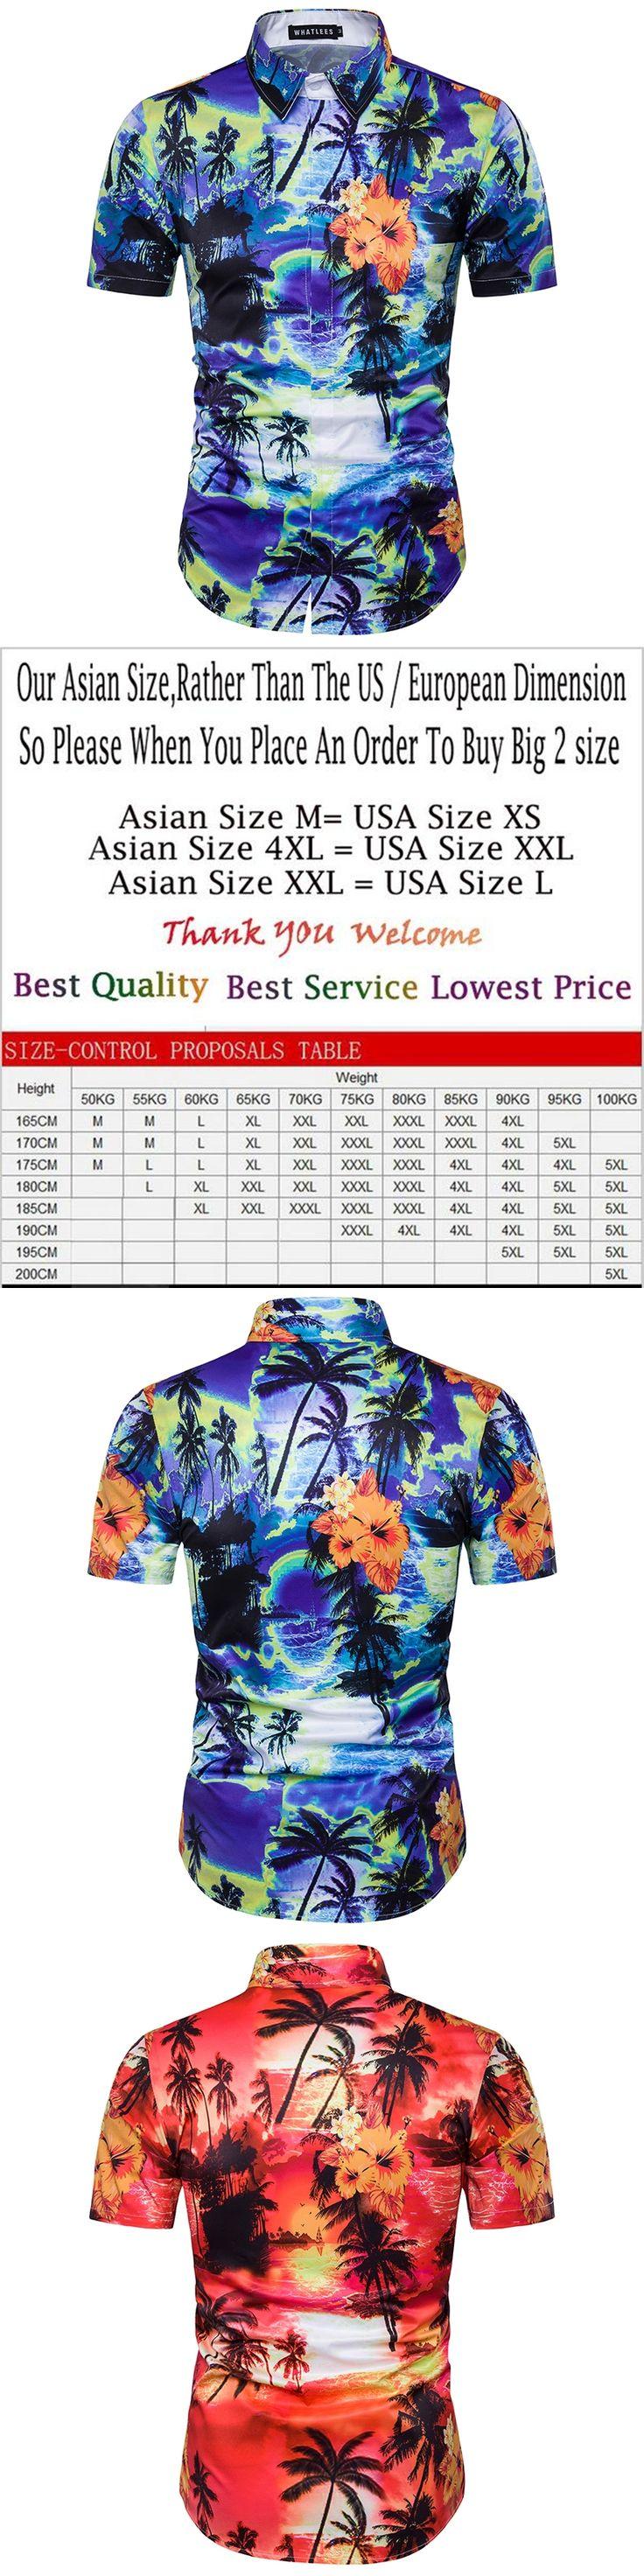 Fashion Designer Dress Shirt 2017 Men Hawaiian Shirt 3D Palm Trees Print Shirts Short Sleeve Casual Shirt camisa masculina M-3XL